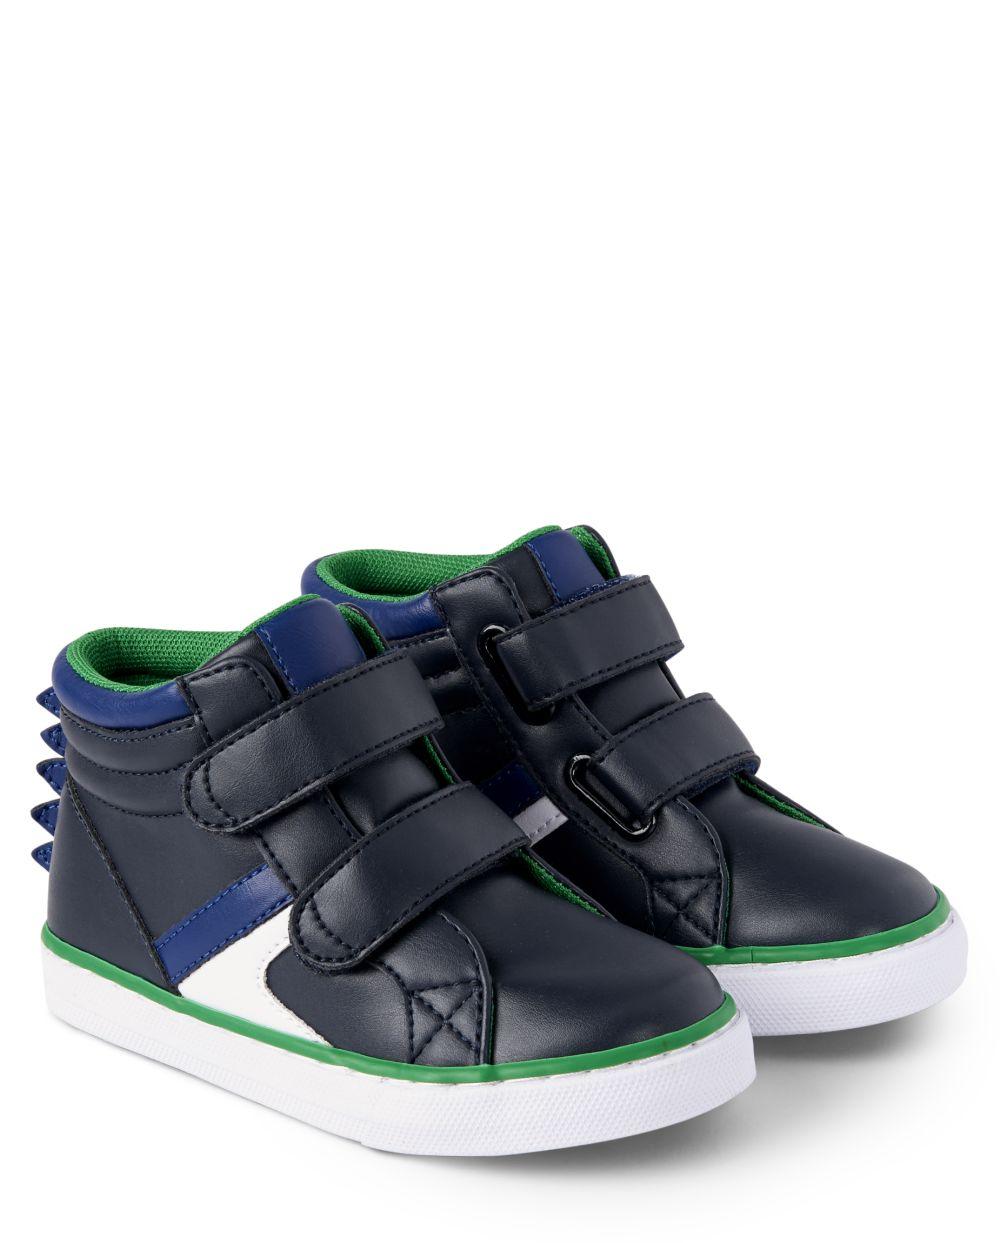 Boys Dino Hi Top Sneakers - Dino Roar